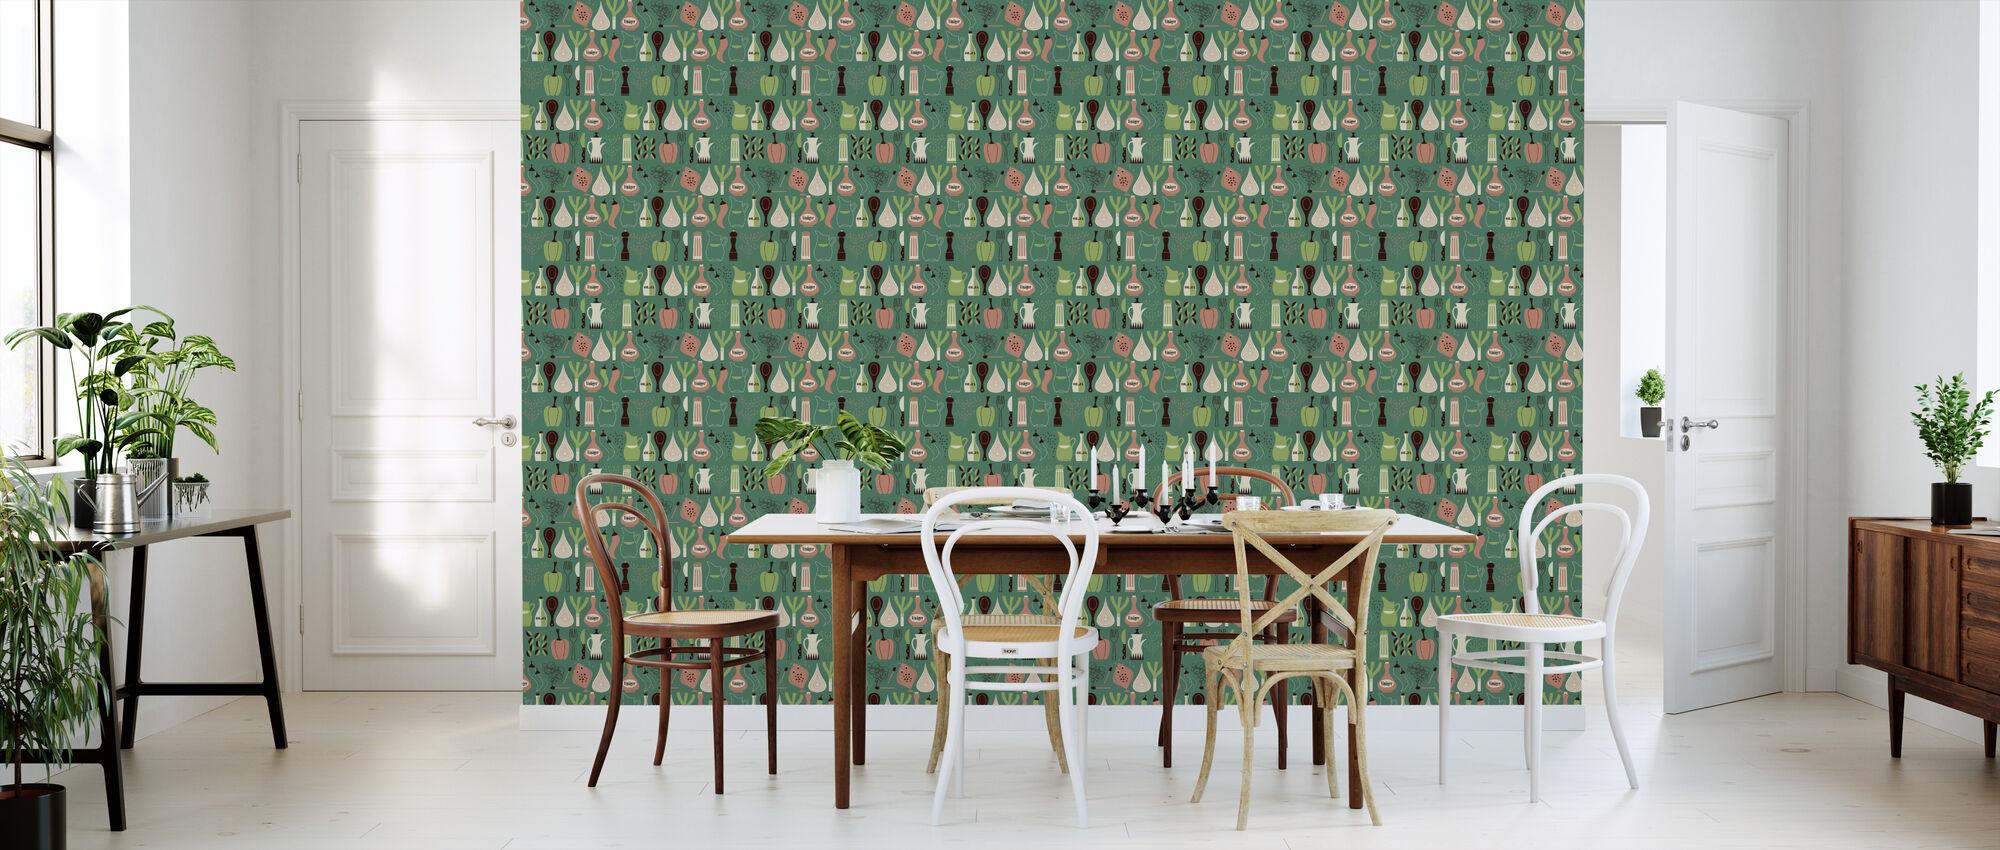 Vinegar - Green - Wallpaper - Kitchen